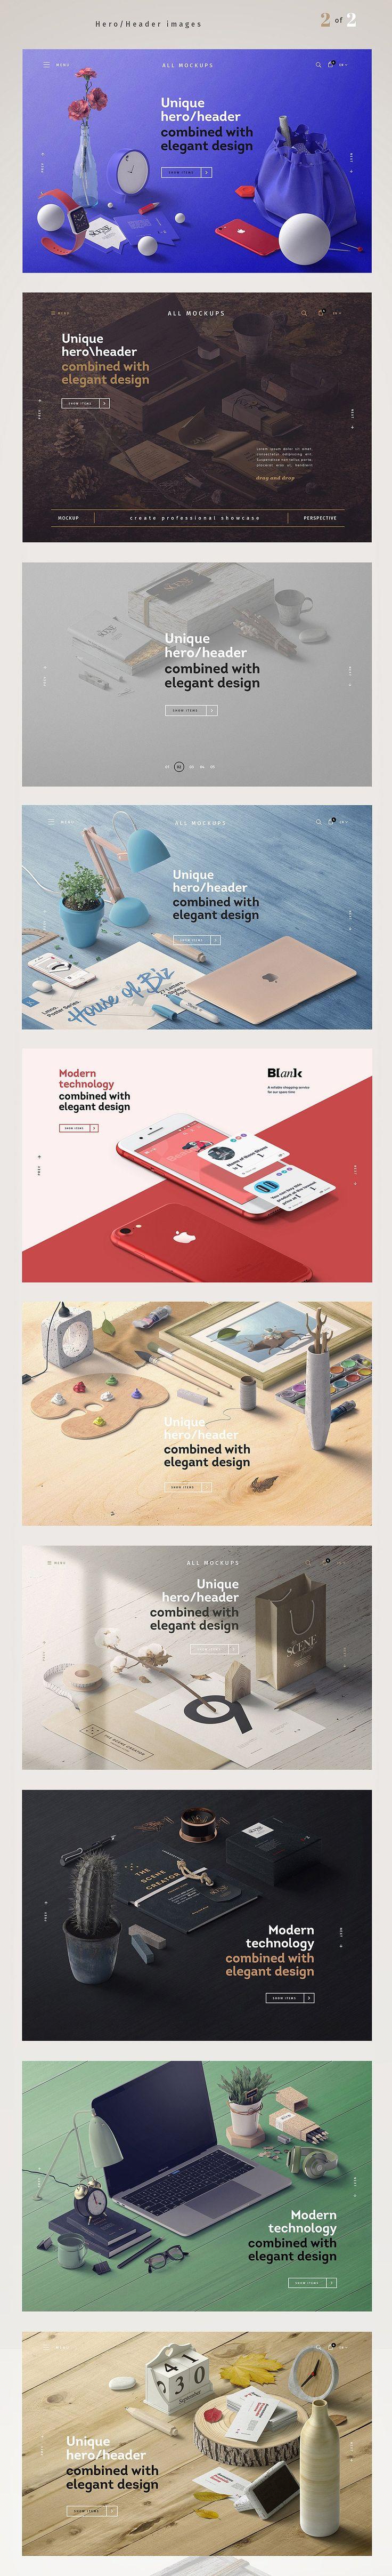 The Scene Creator | Perspective by Aleksey_Belorukov on @creativemarket #ad